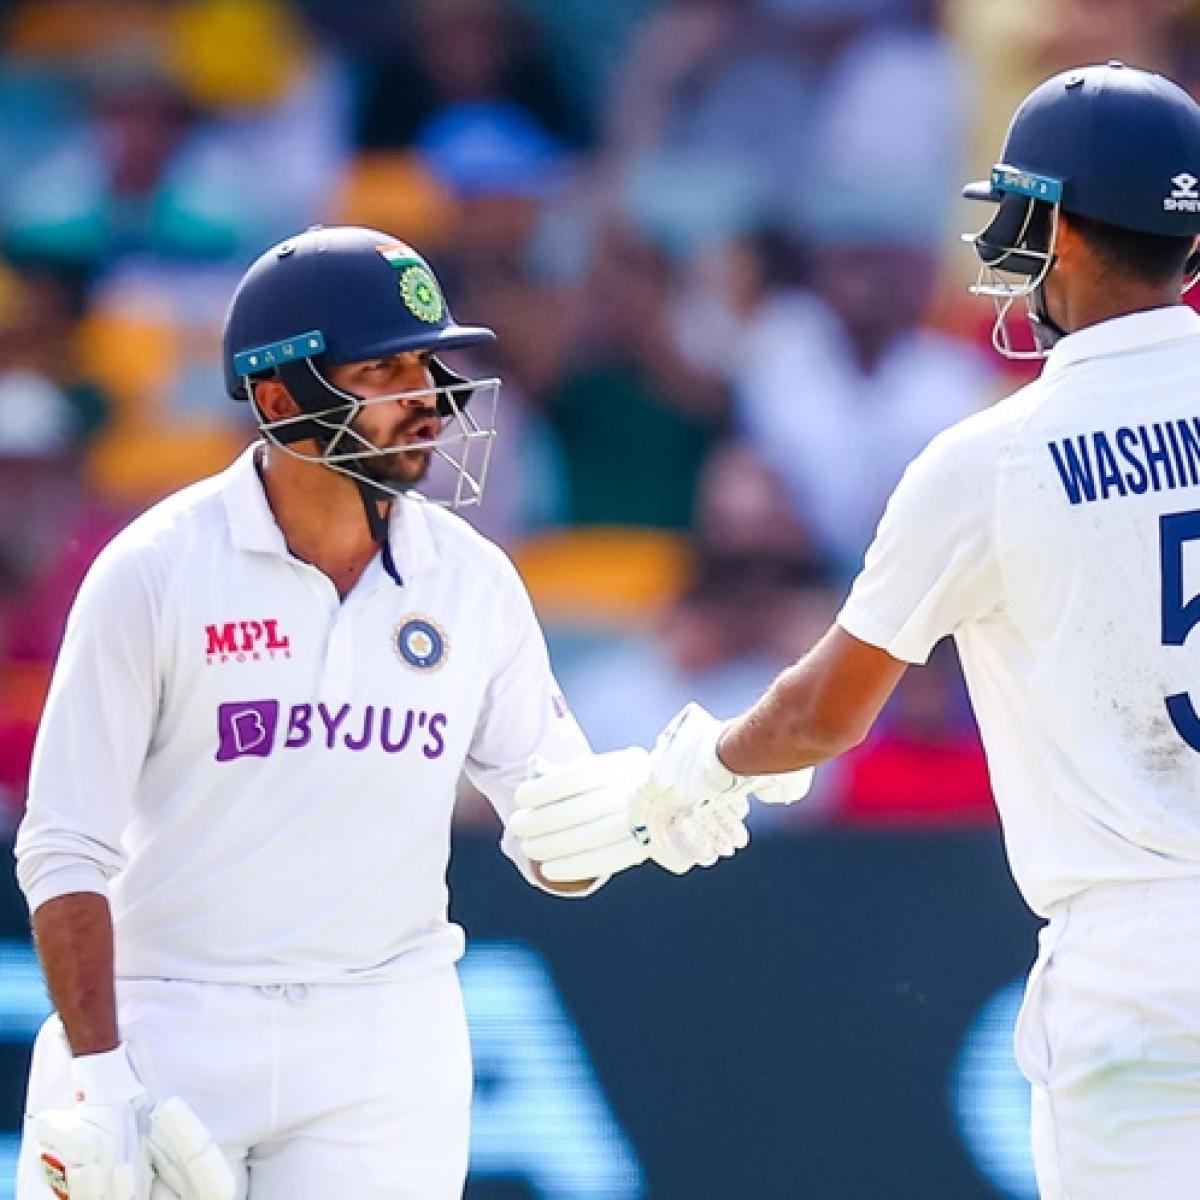 Ind vs Aus, 4th Test: India fight back through Washington and Thakur, concede 33-run lead